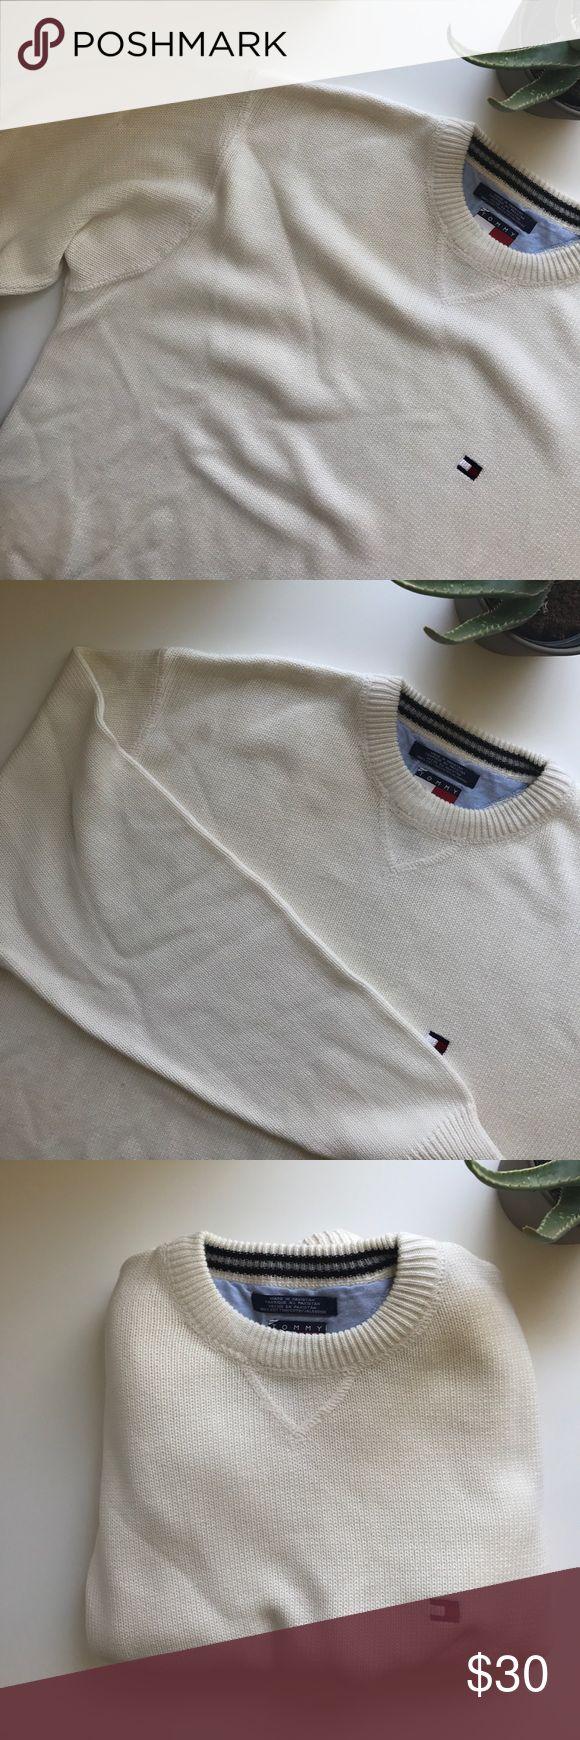 *dotd* tommy hilfiger off-white sweater tommy hilfiger off-white/cream crew knit sweater                                               men's large Tommy Hilfiger Sweaters Crewneck